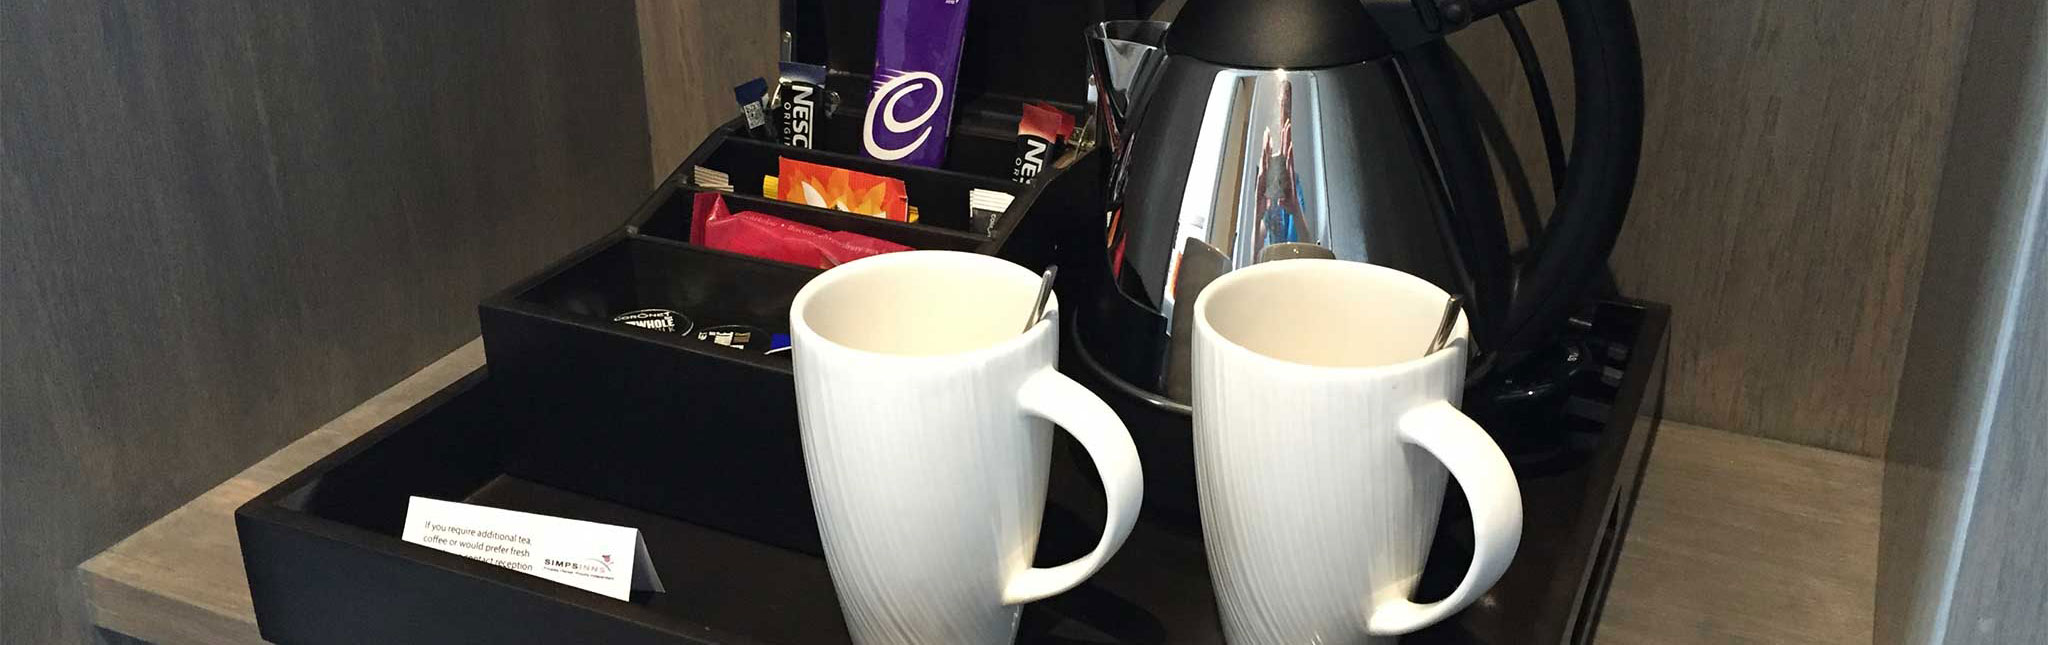 ACCOM_tea_coffee.jpg